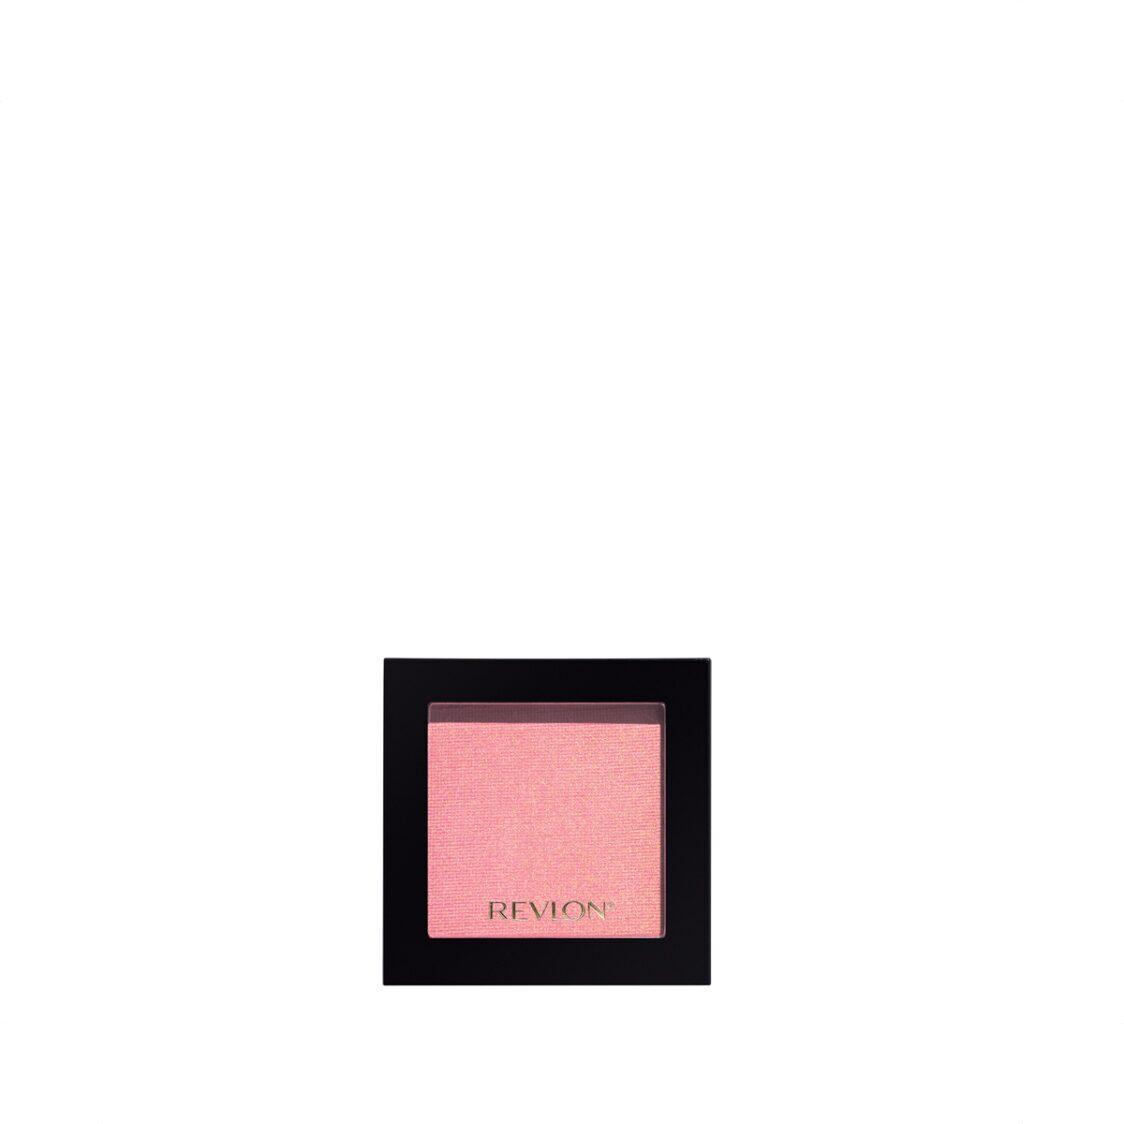 Revlon Powder Blush